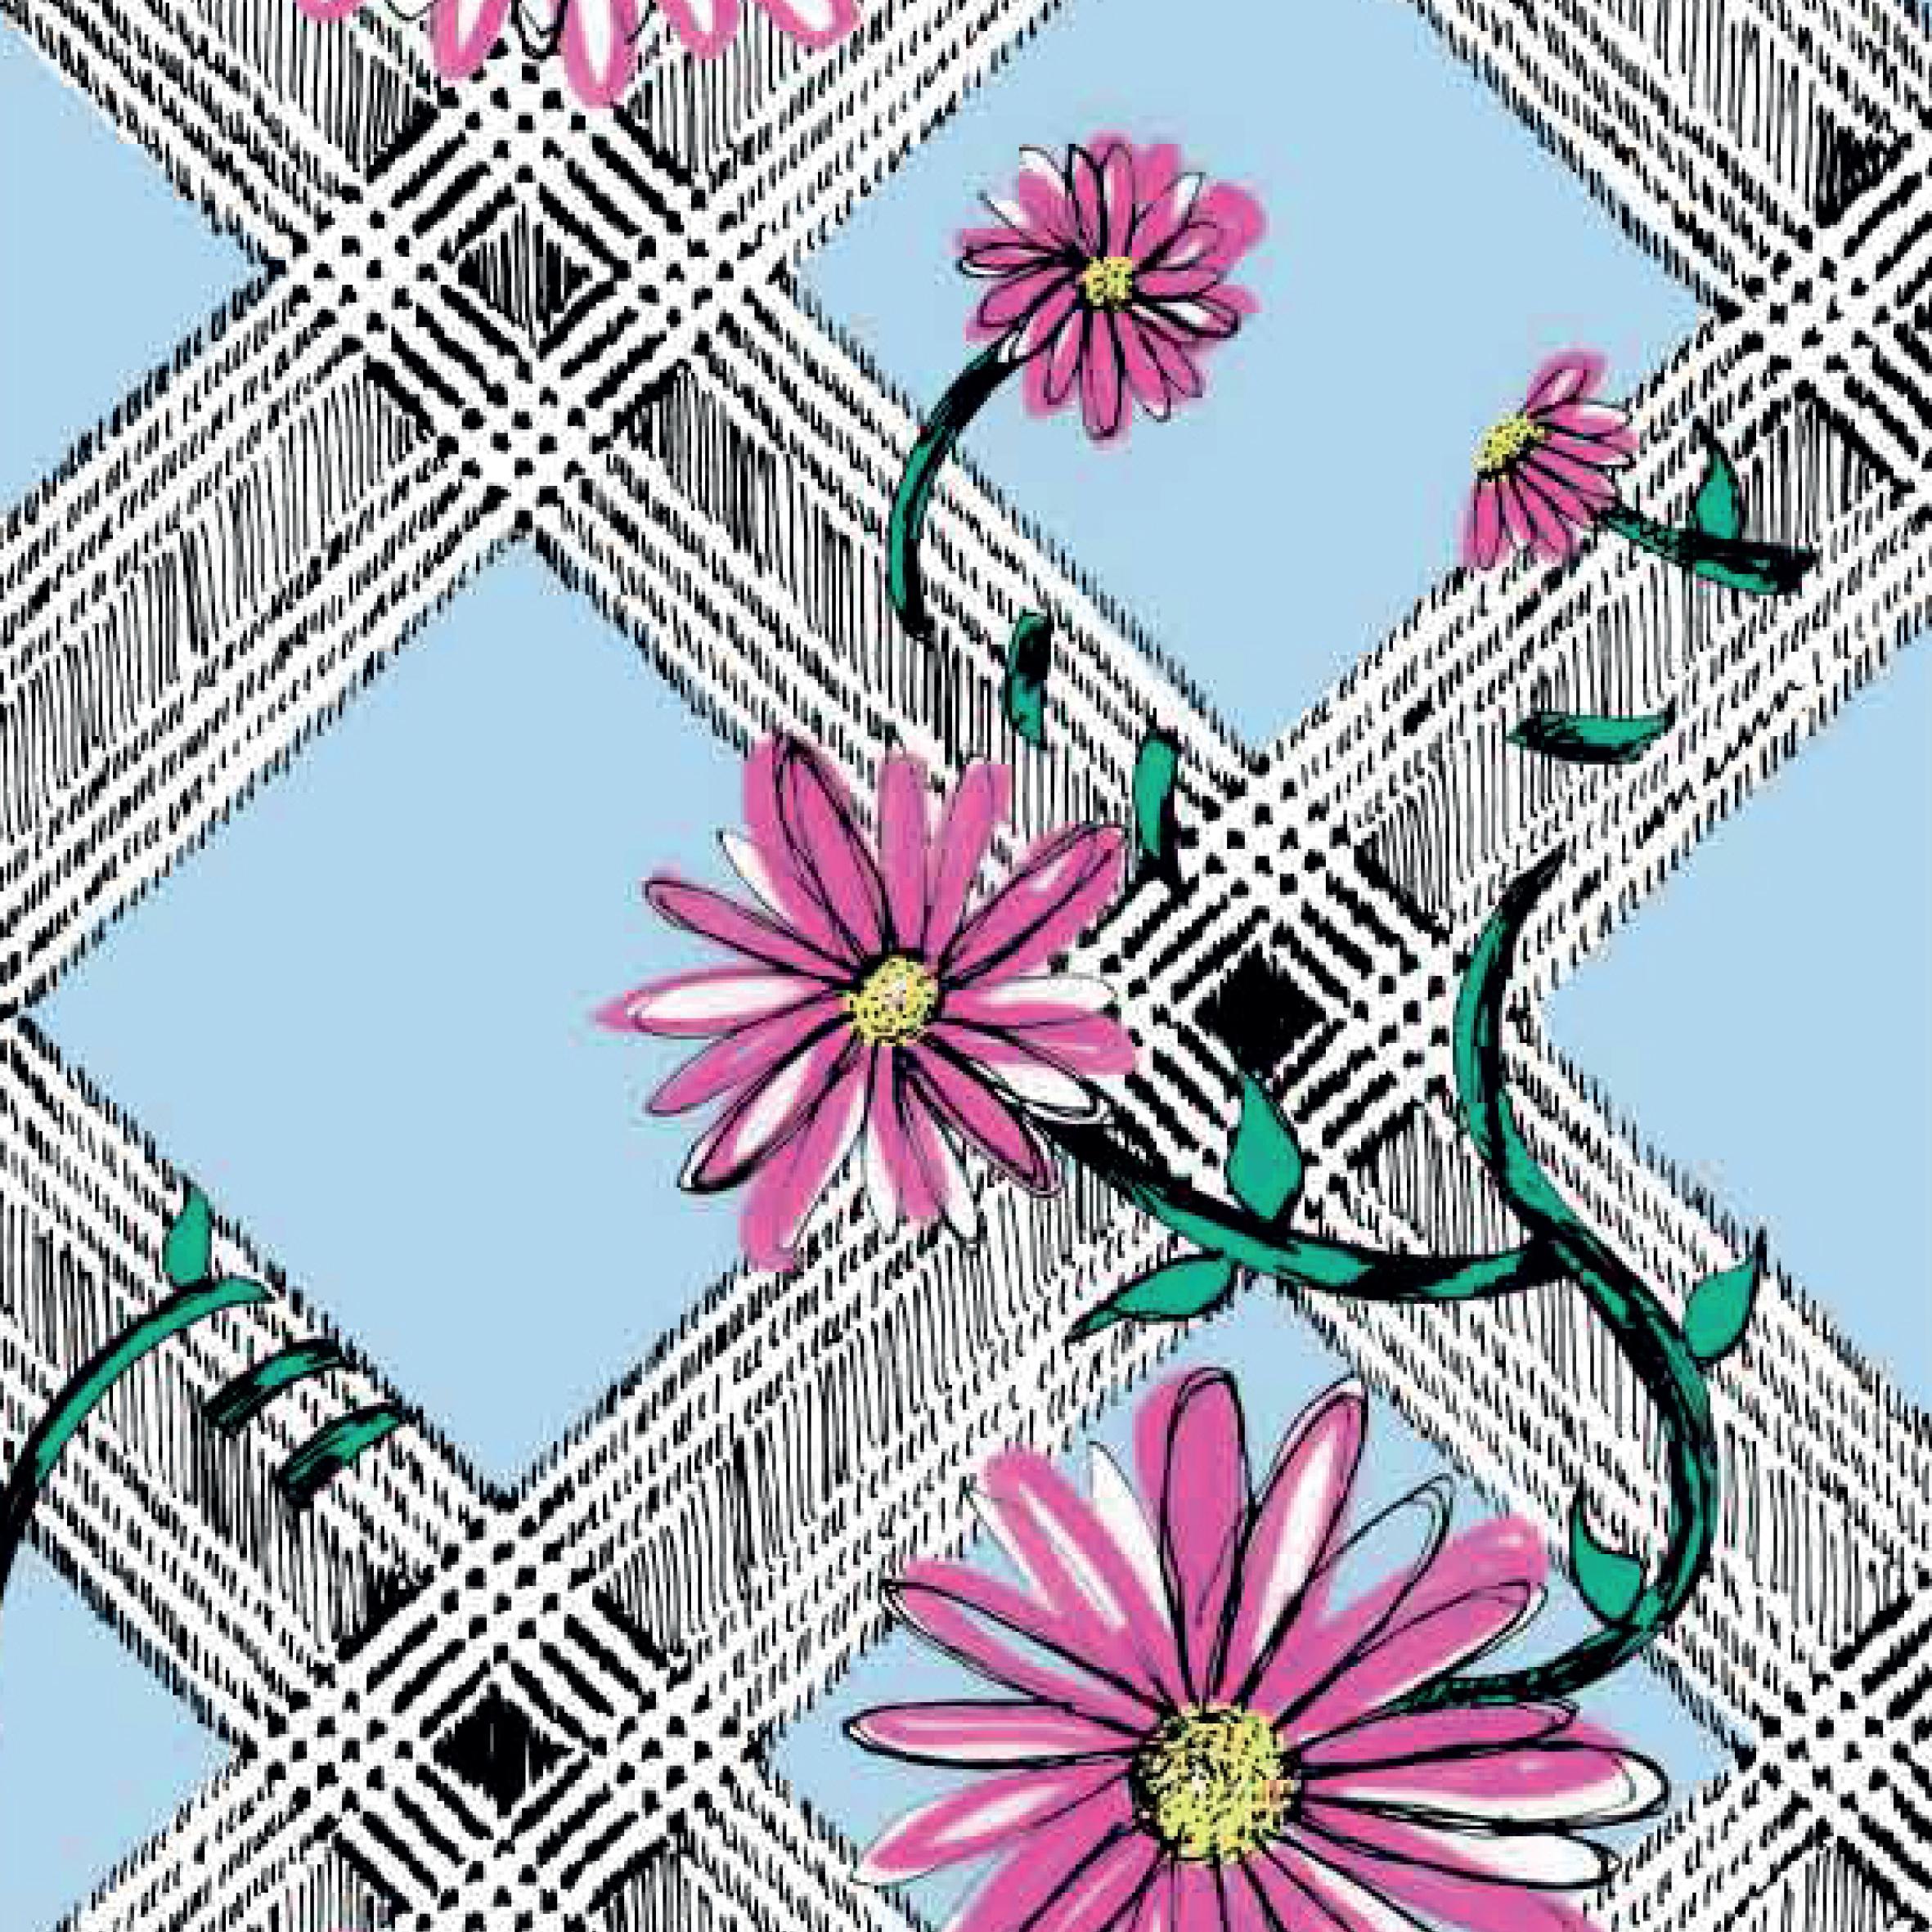 Flower PLAID PRINT2.jpg